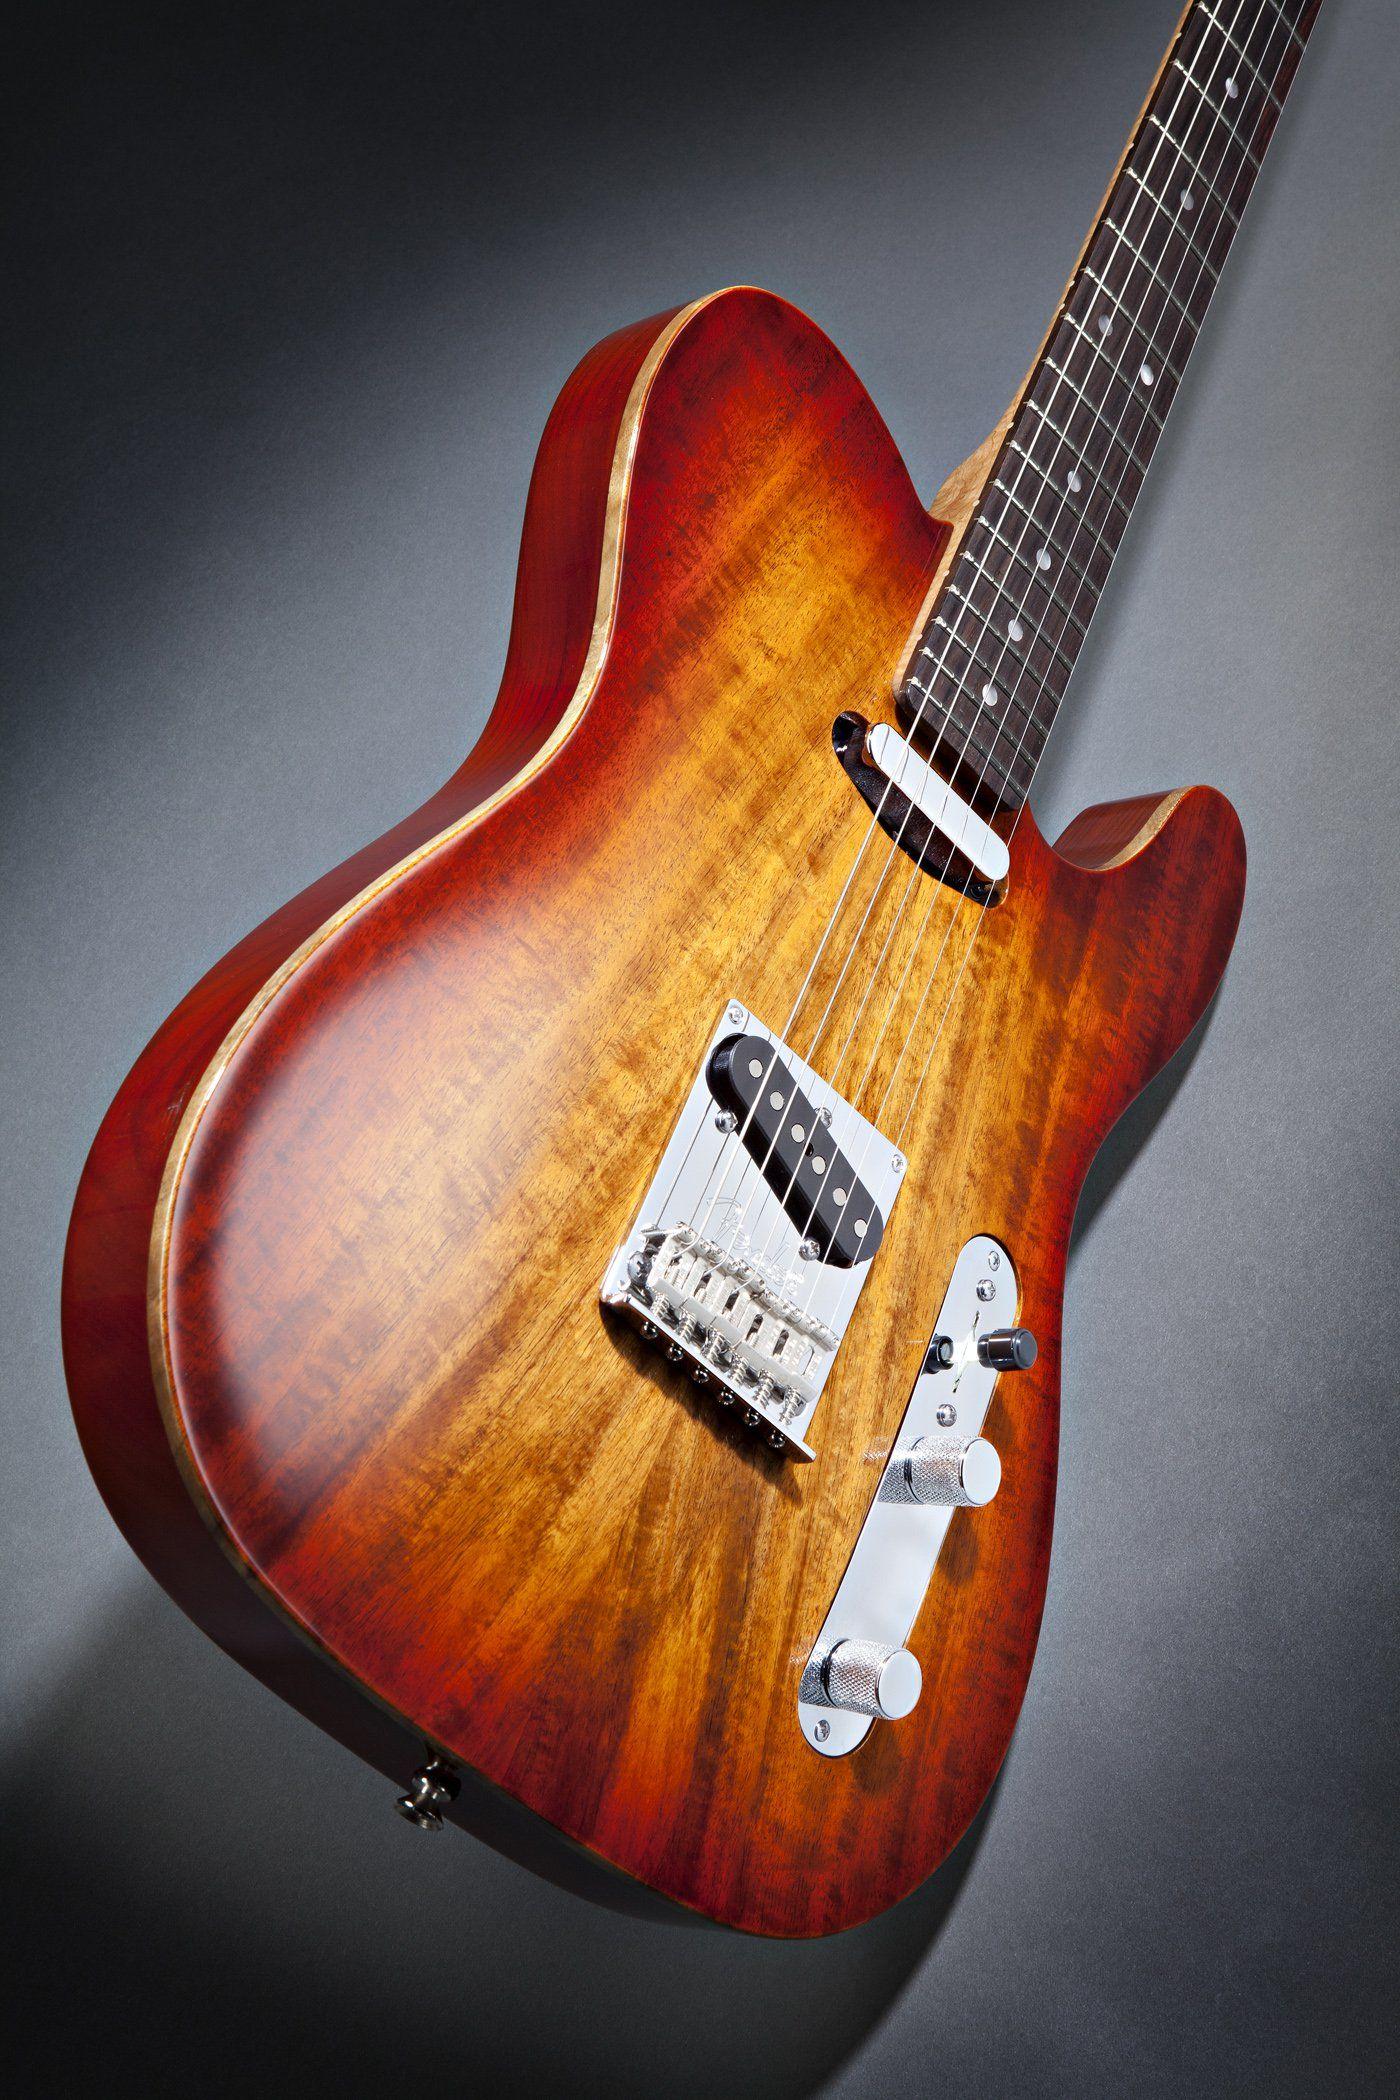 Fender select carved koa top telecaster_up beautyjpg